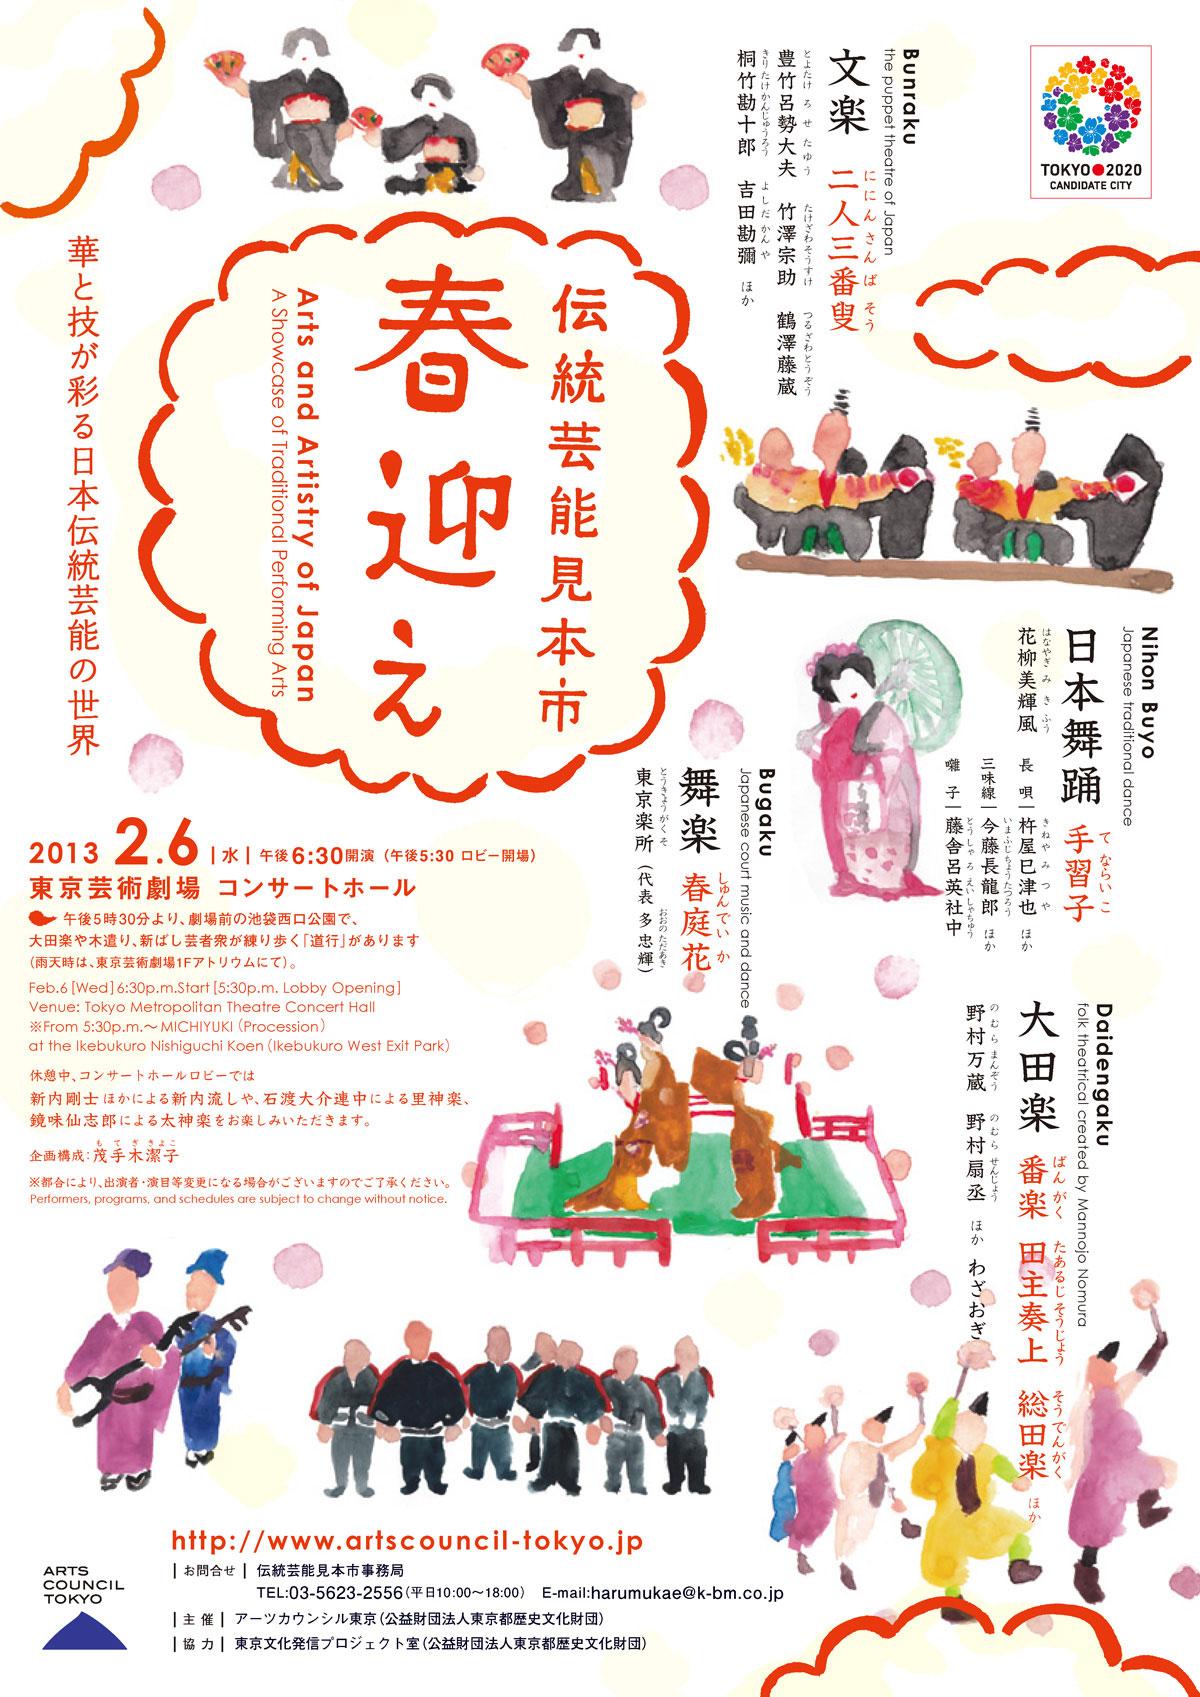 2013. 2. 6 (水)伝統芸能見本市「春迎え」